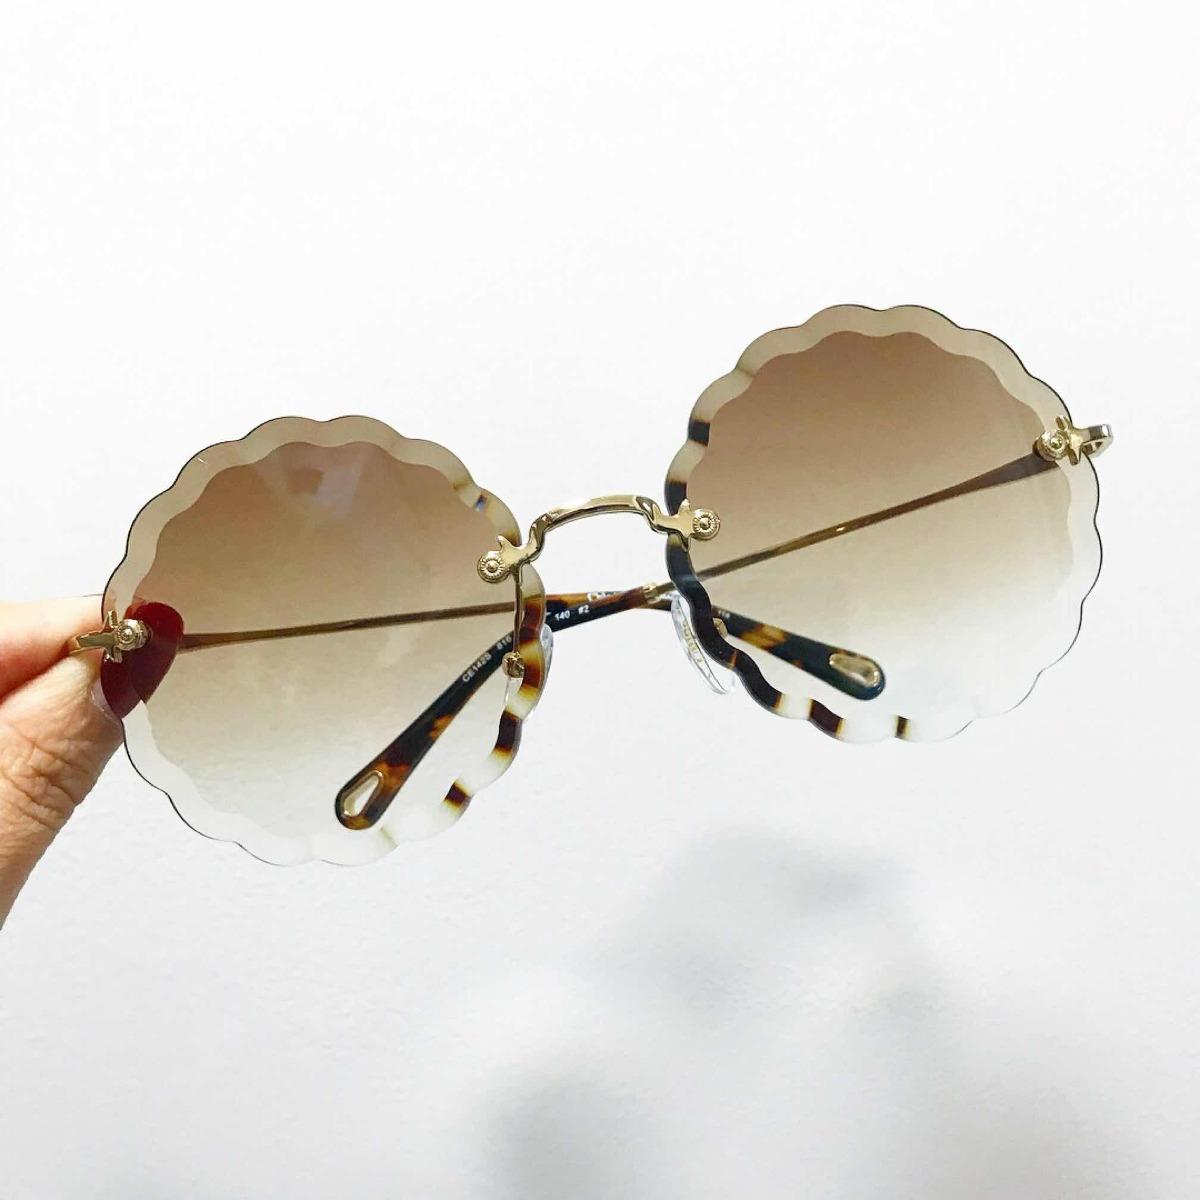 8214b02f1aea5 óculos chloé rosie carlina redondo flower feminino. Carregando zoom.